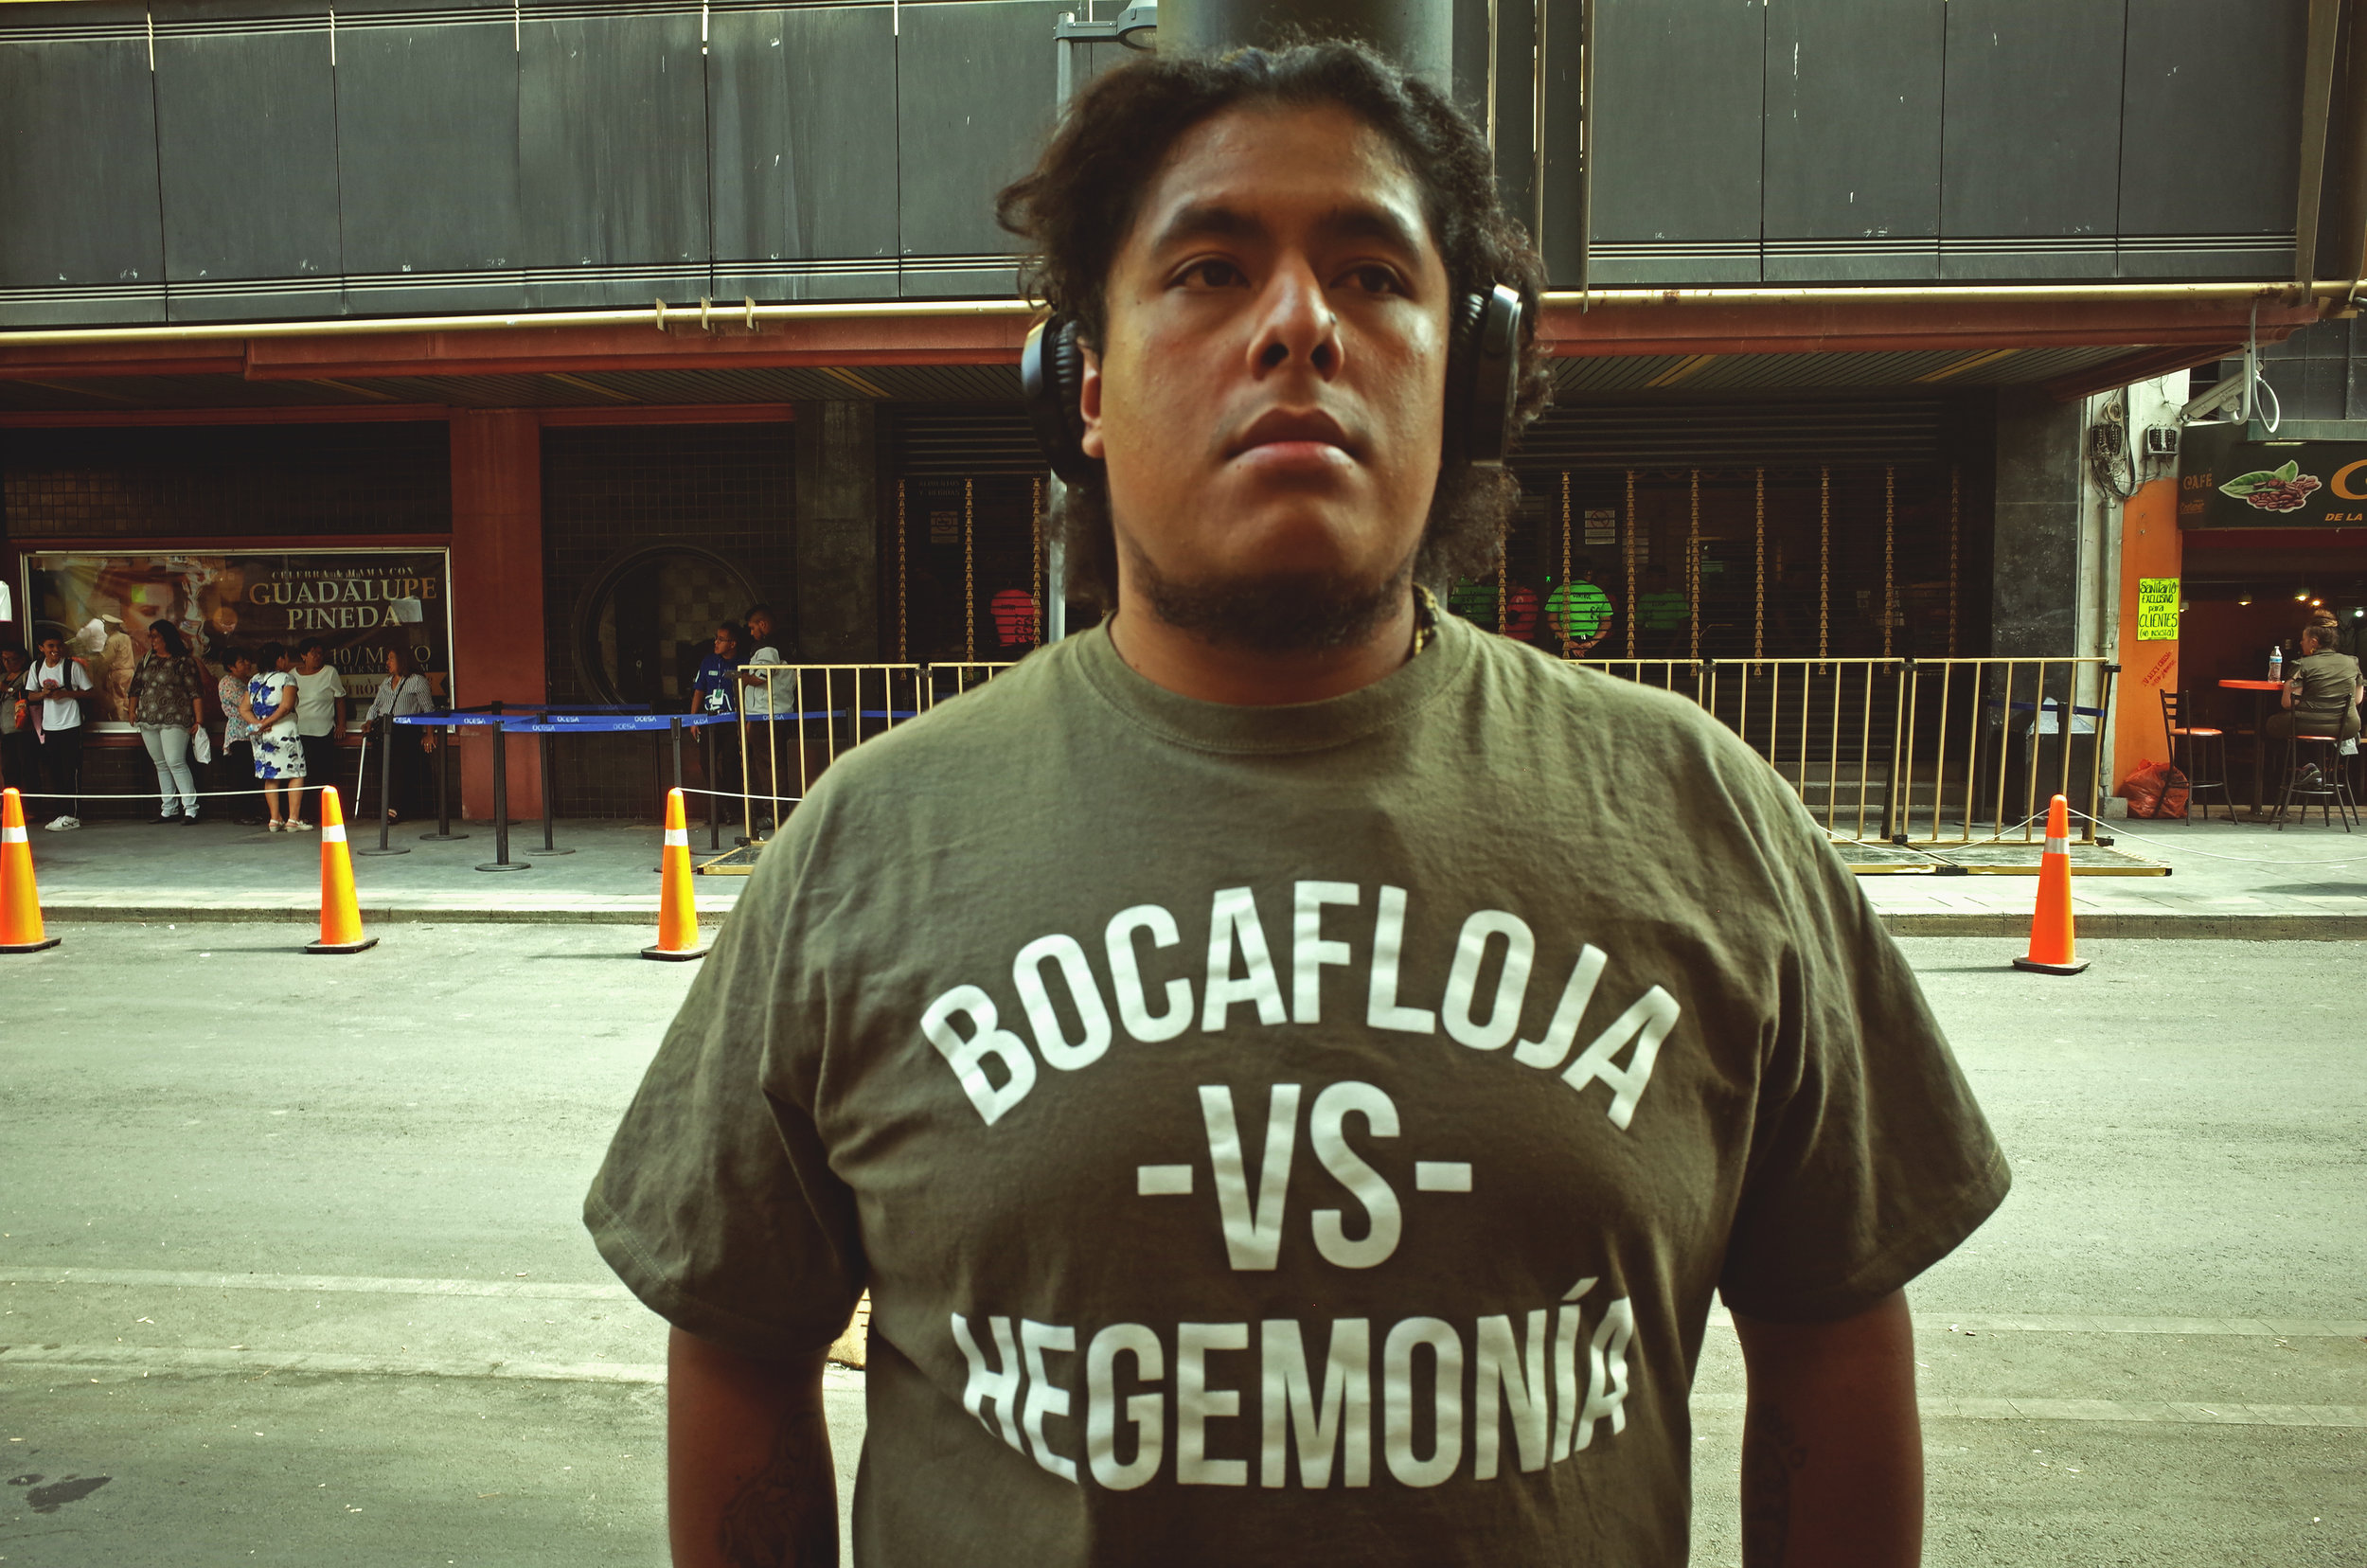 Contrahegemonía ©Bocafloja